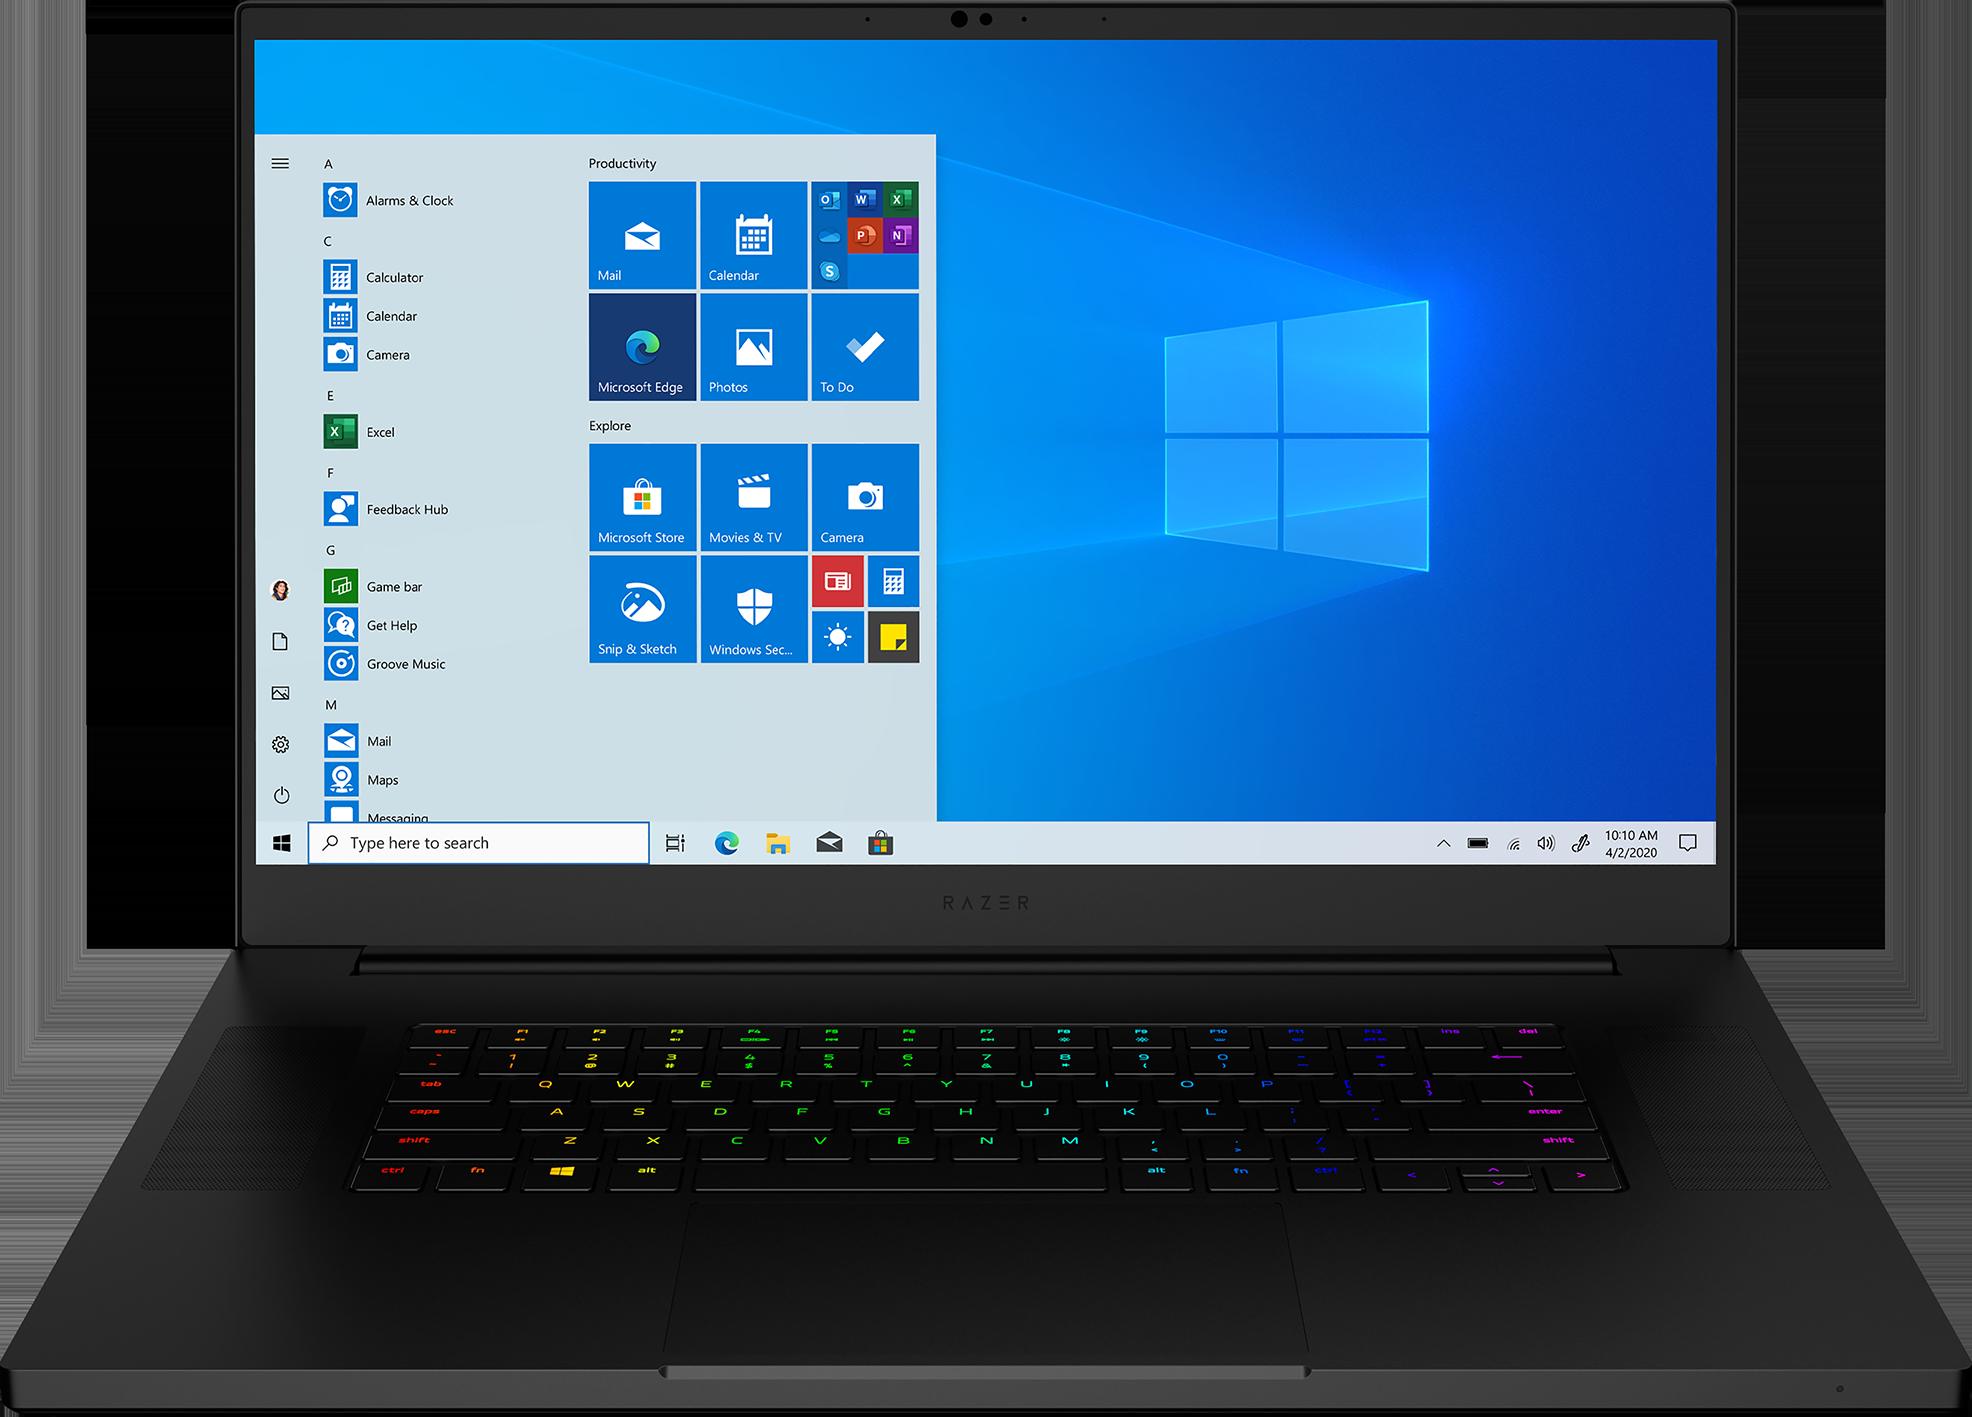 Razer Blade Pro 17.3 Laptop 17.3-inch QHD display Intel Core i7-10875H 16 GB memory/512 GB SSD NVIDIA GeForce RTX 3070